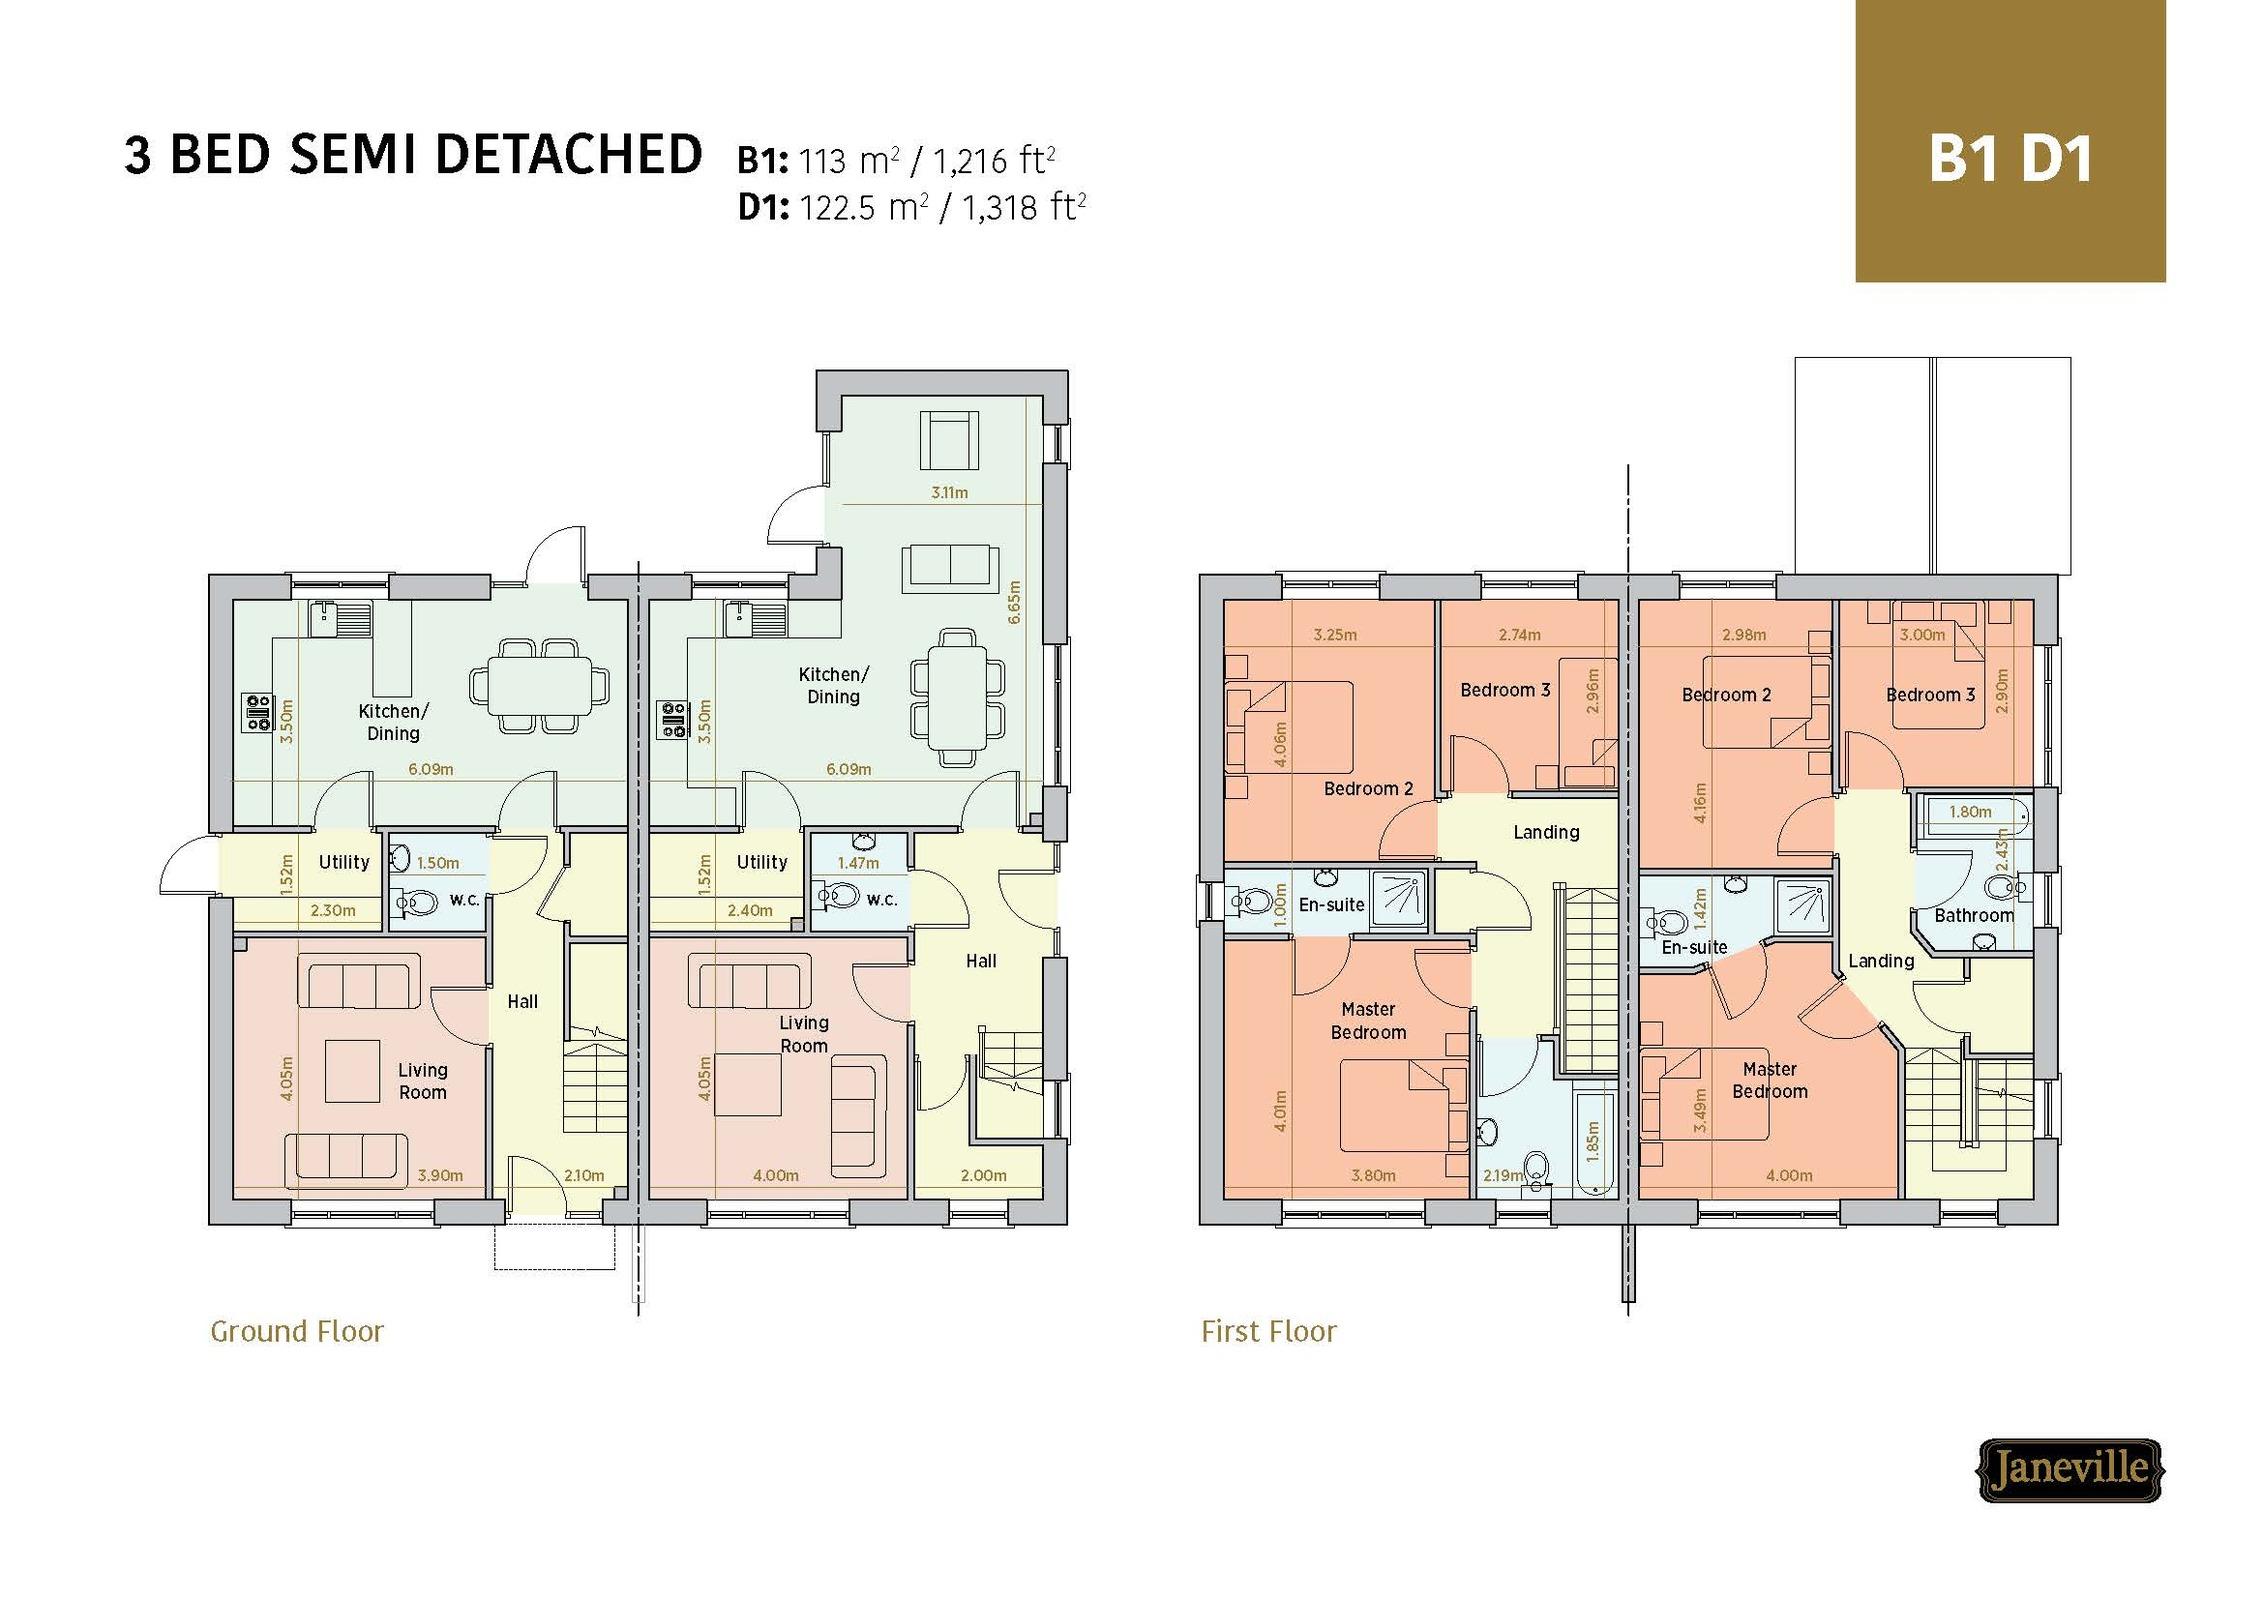 D1 House Type, 3 Bed Semi, 'Janeville', Carrigaline, Co. Cork